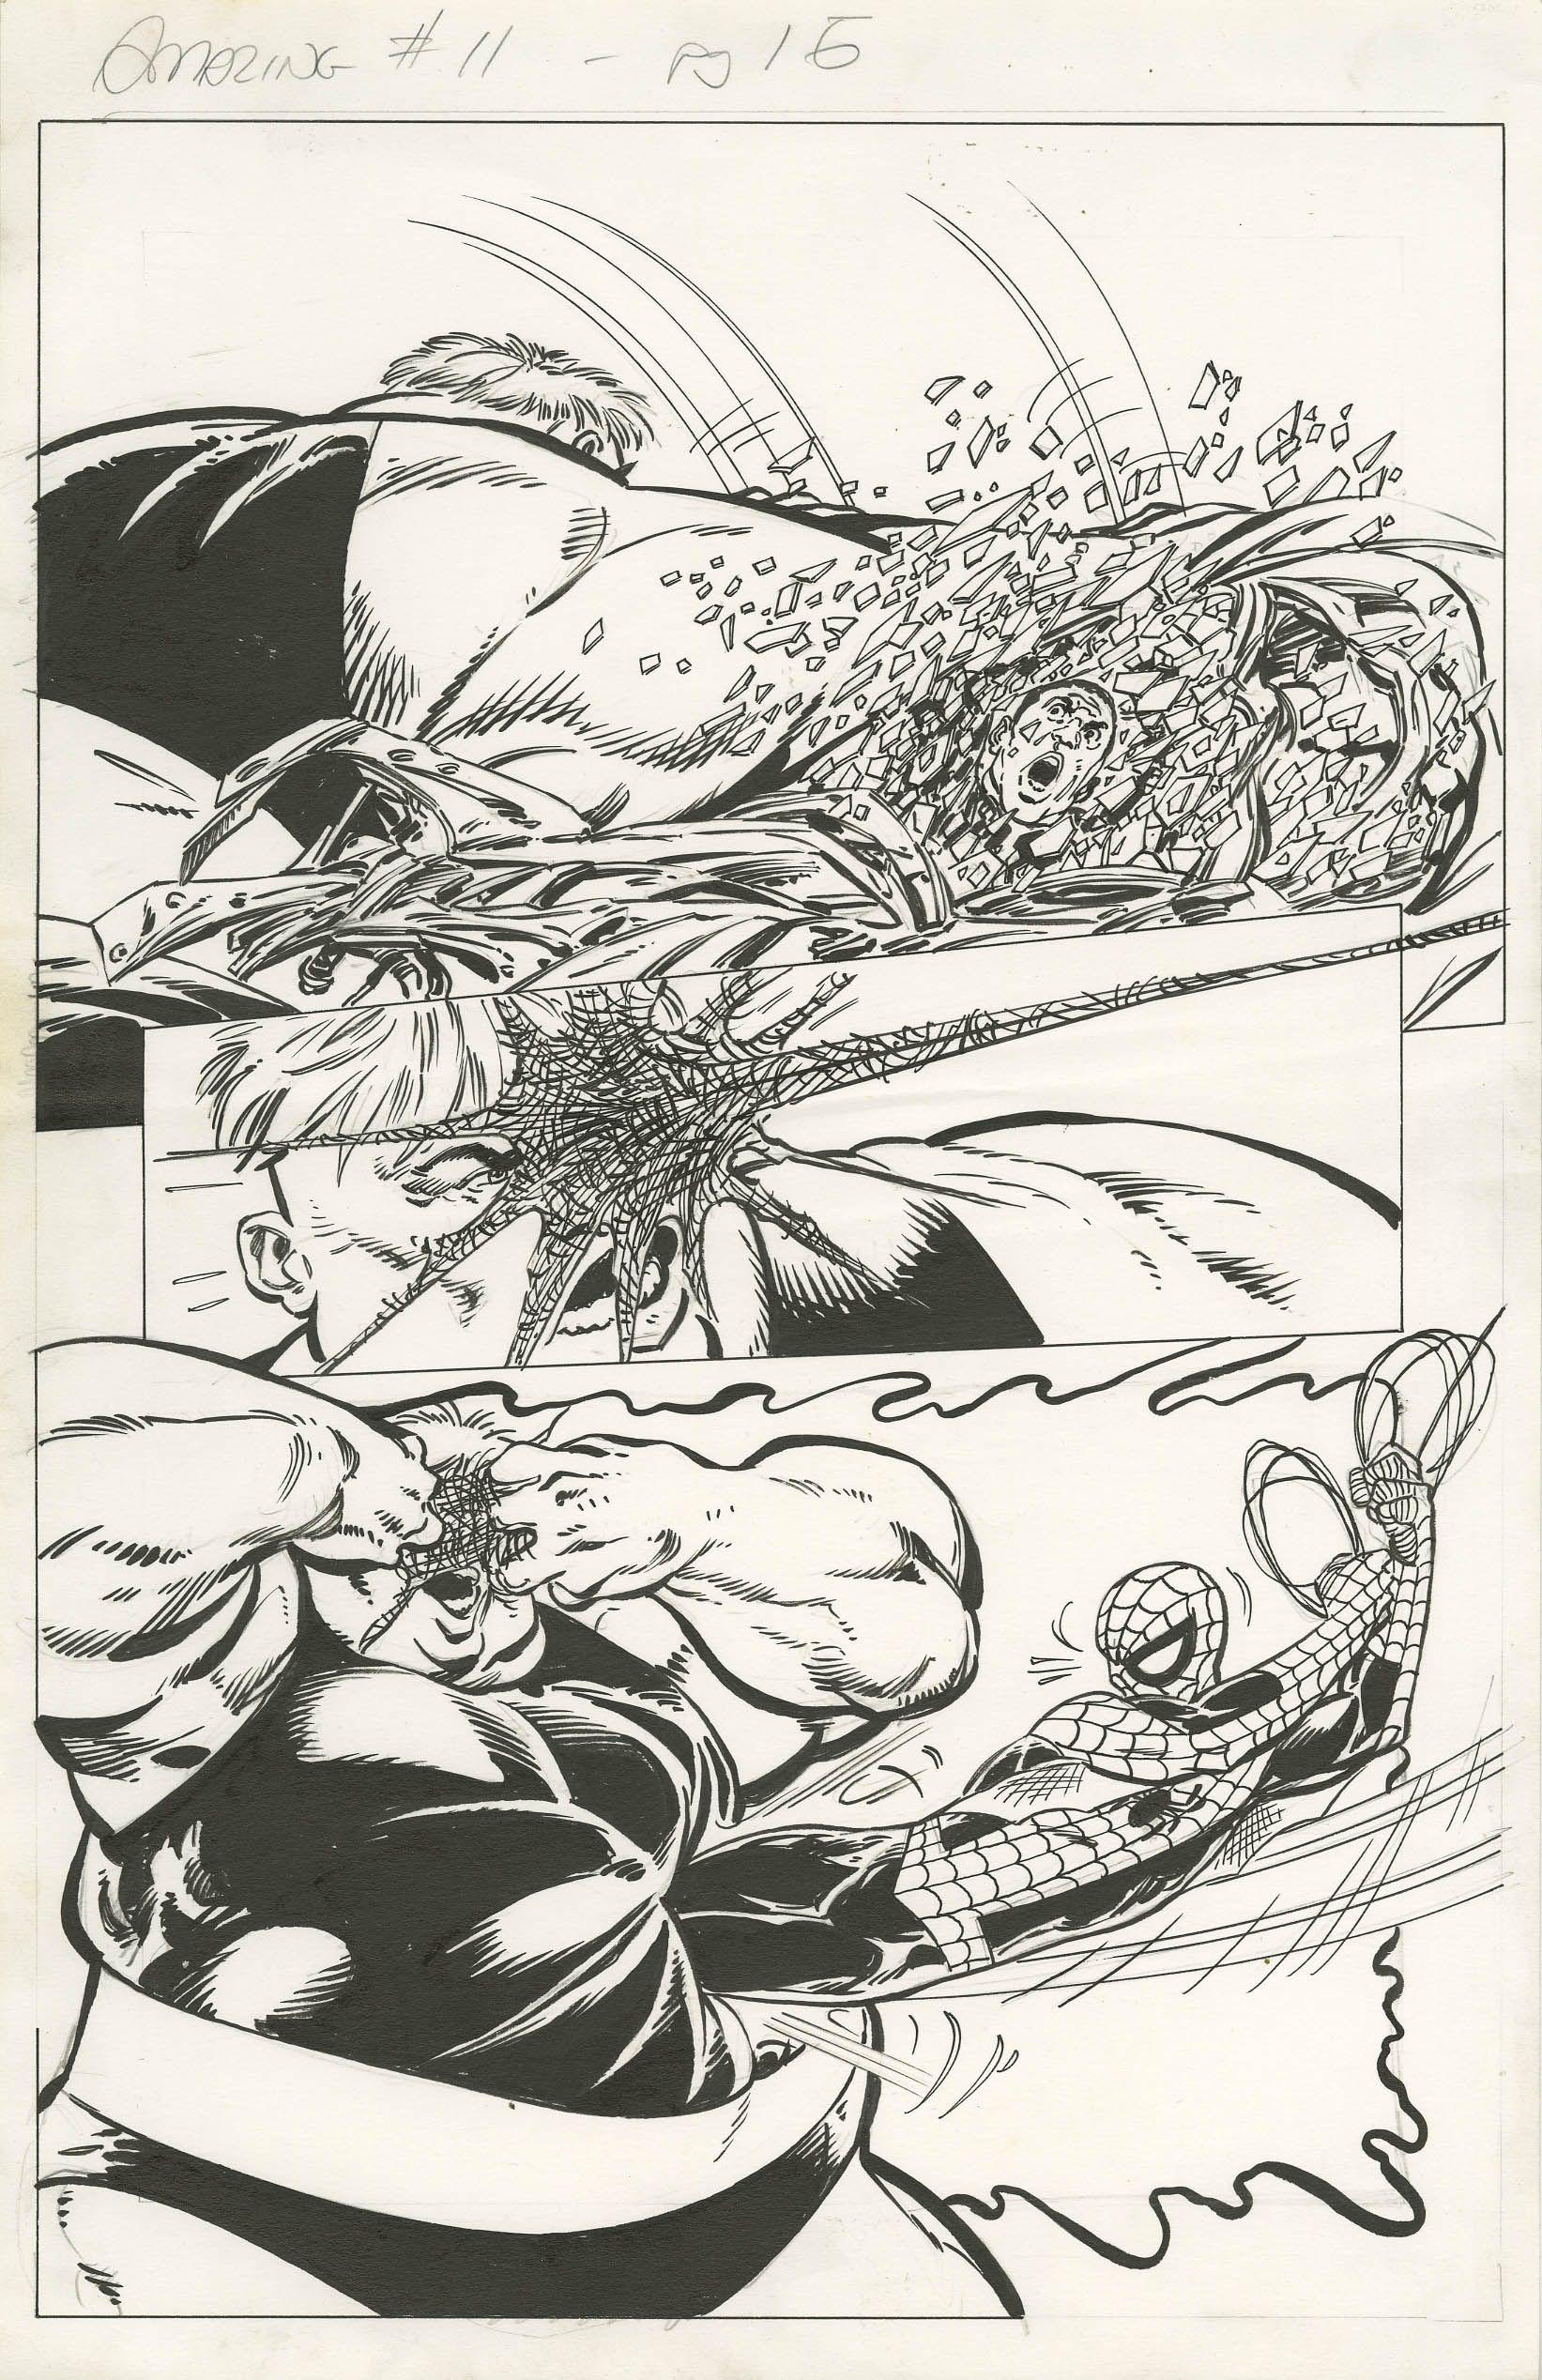 AMAZING SPIDER-MAN #11 PAGE 15 - JOHN BYRNE  1999, Spider-Man Battles the Blob - W.B.